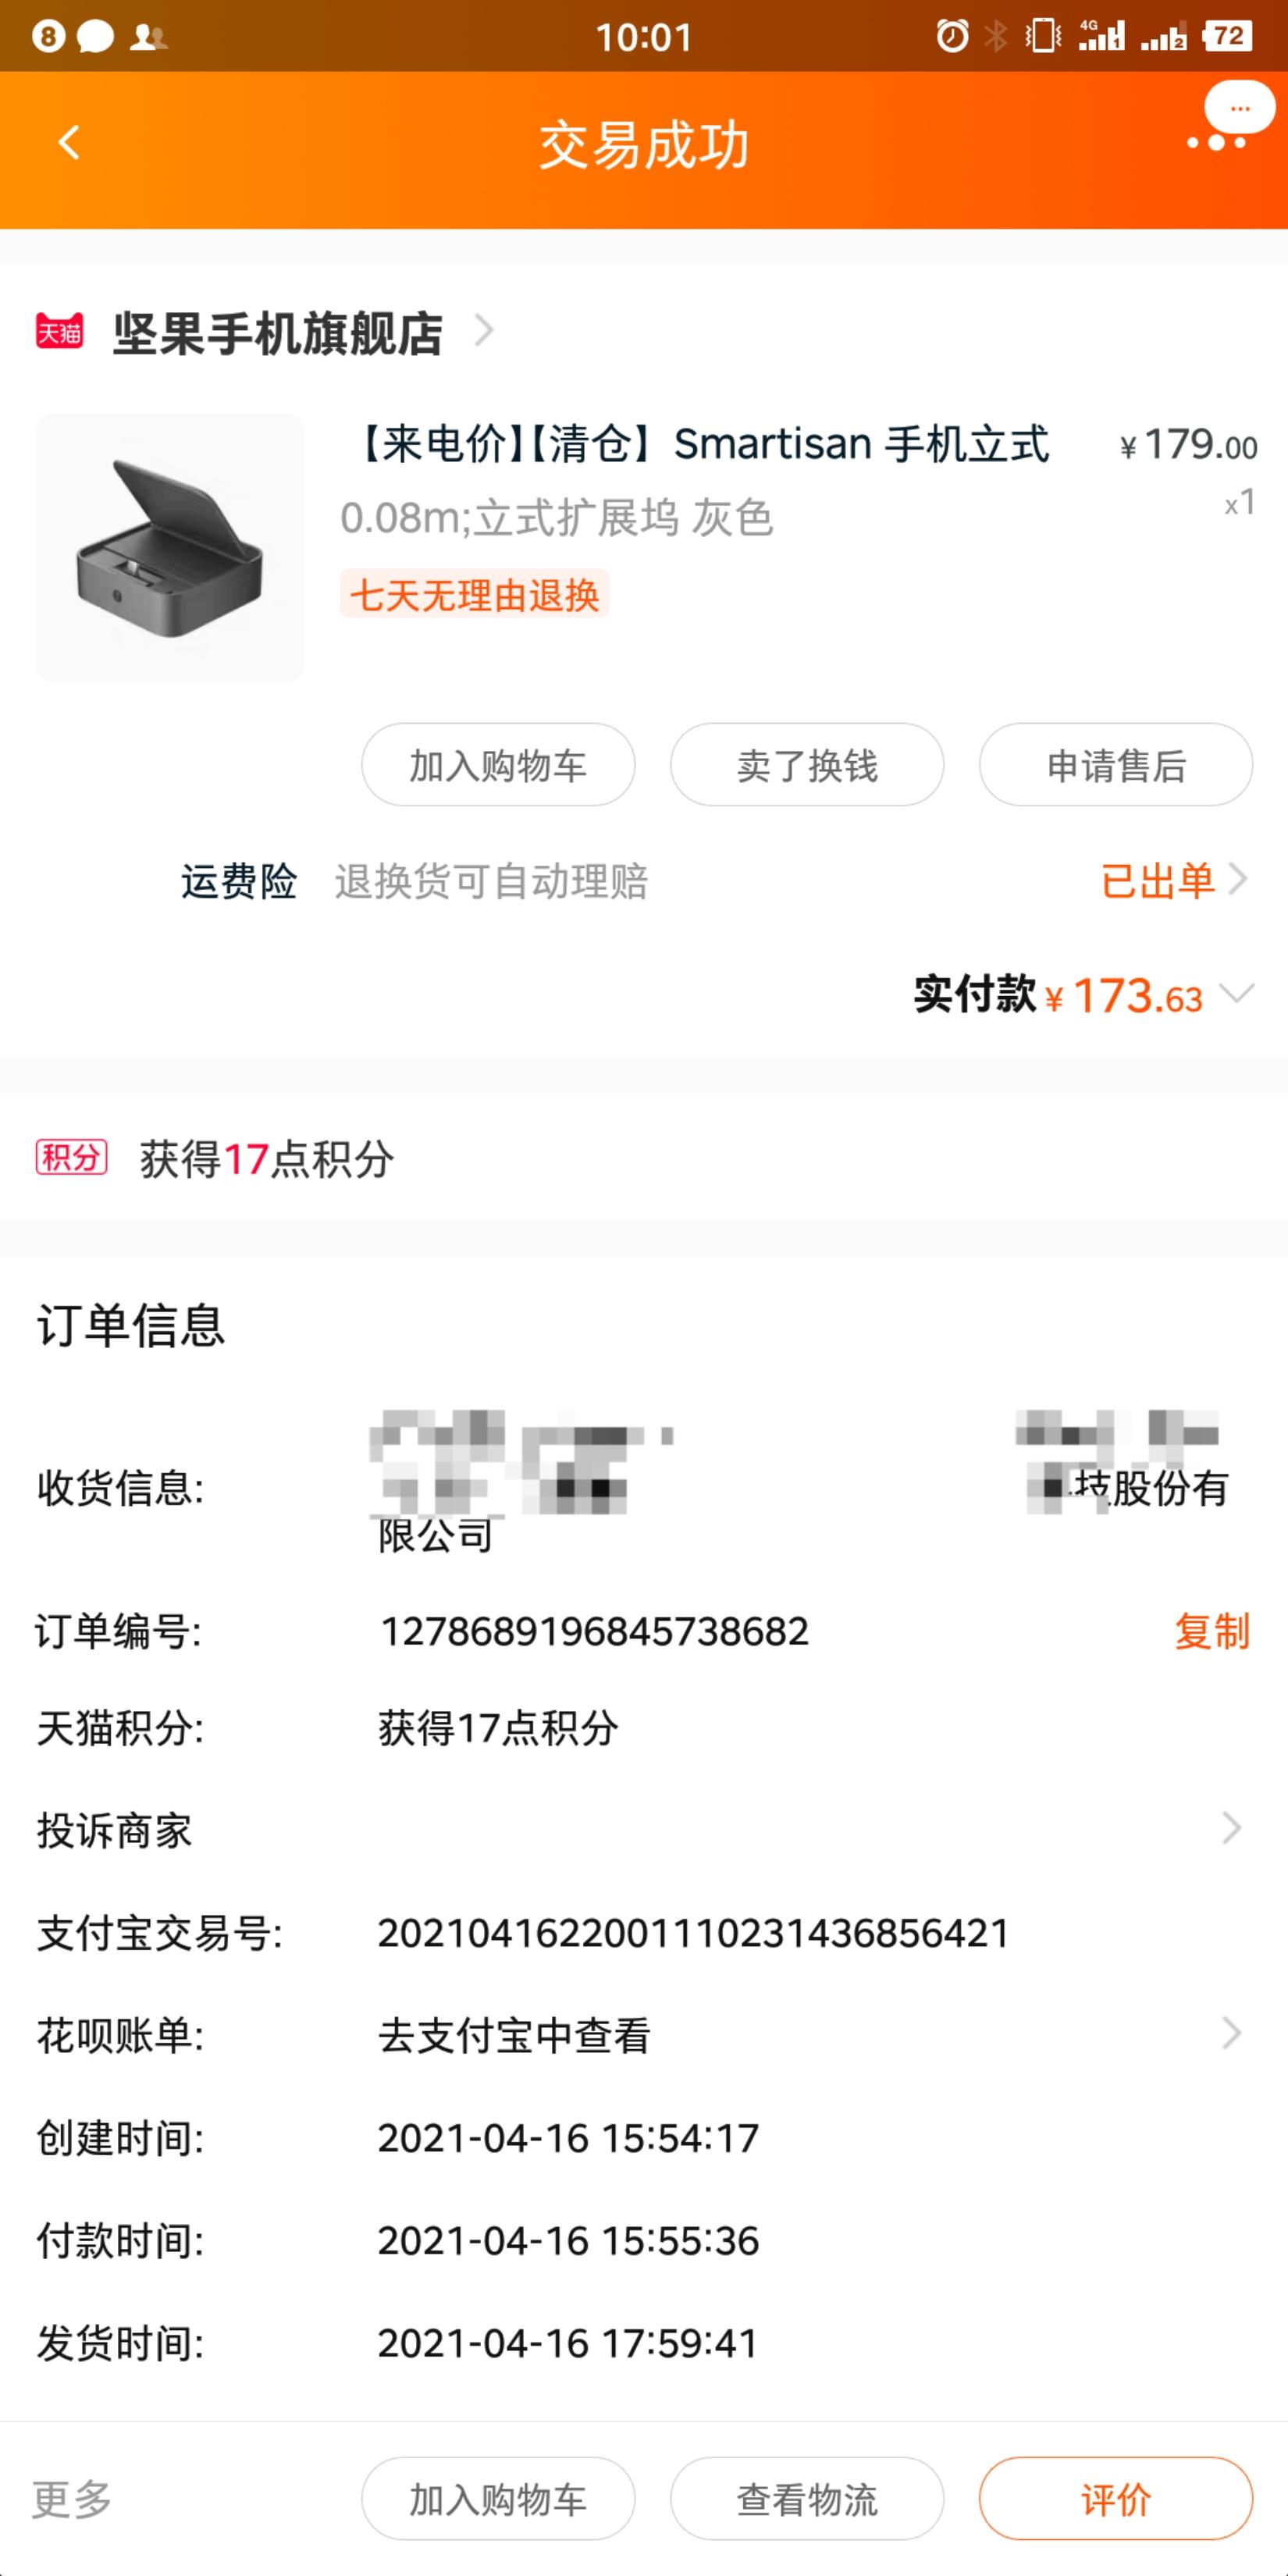 ??_Screenshot_2021-04-19-10-01-56-564_????.png